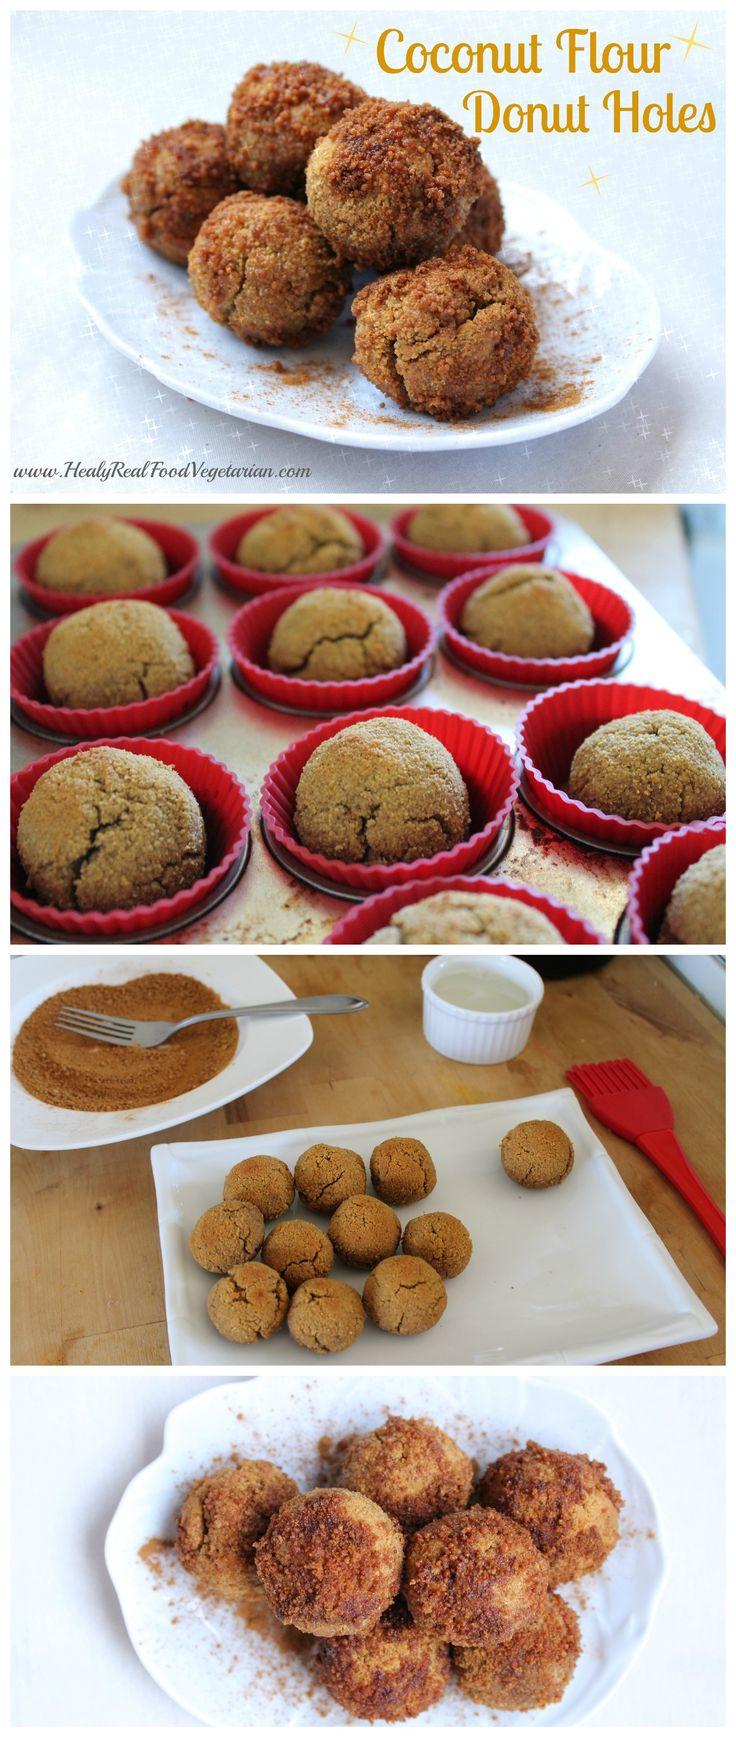 Coconut Flour Donut Holes @ Healy Real Food Vegetarian